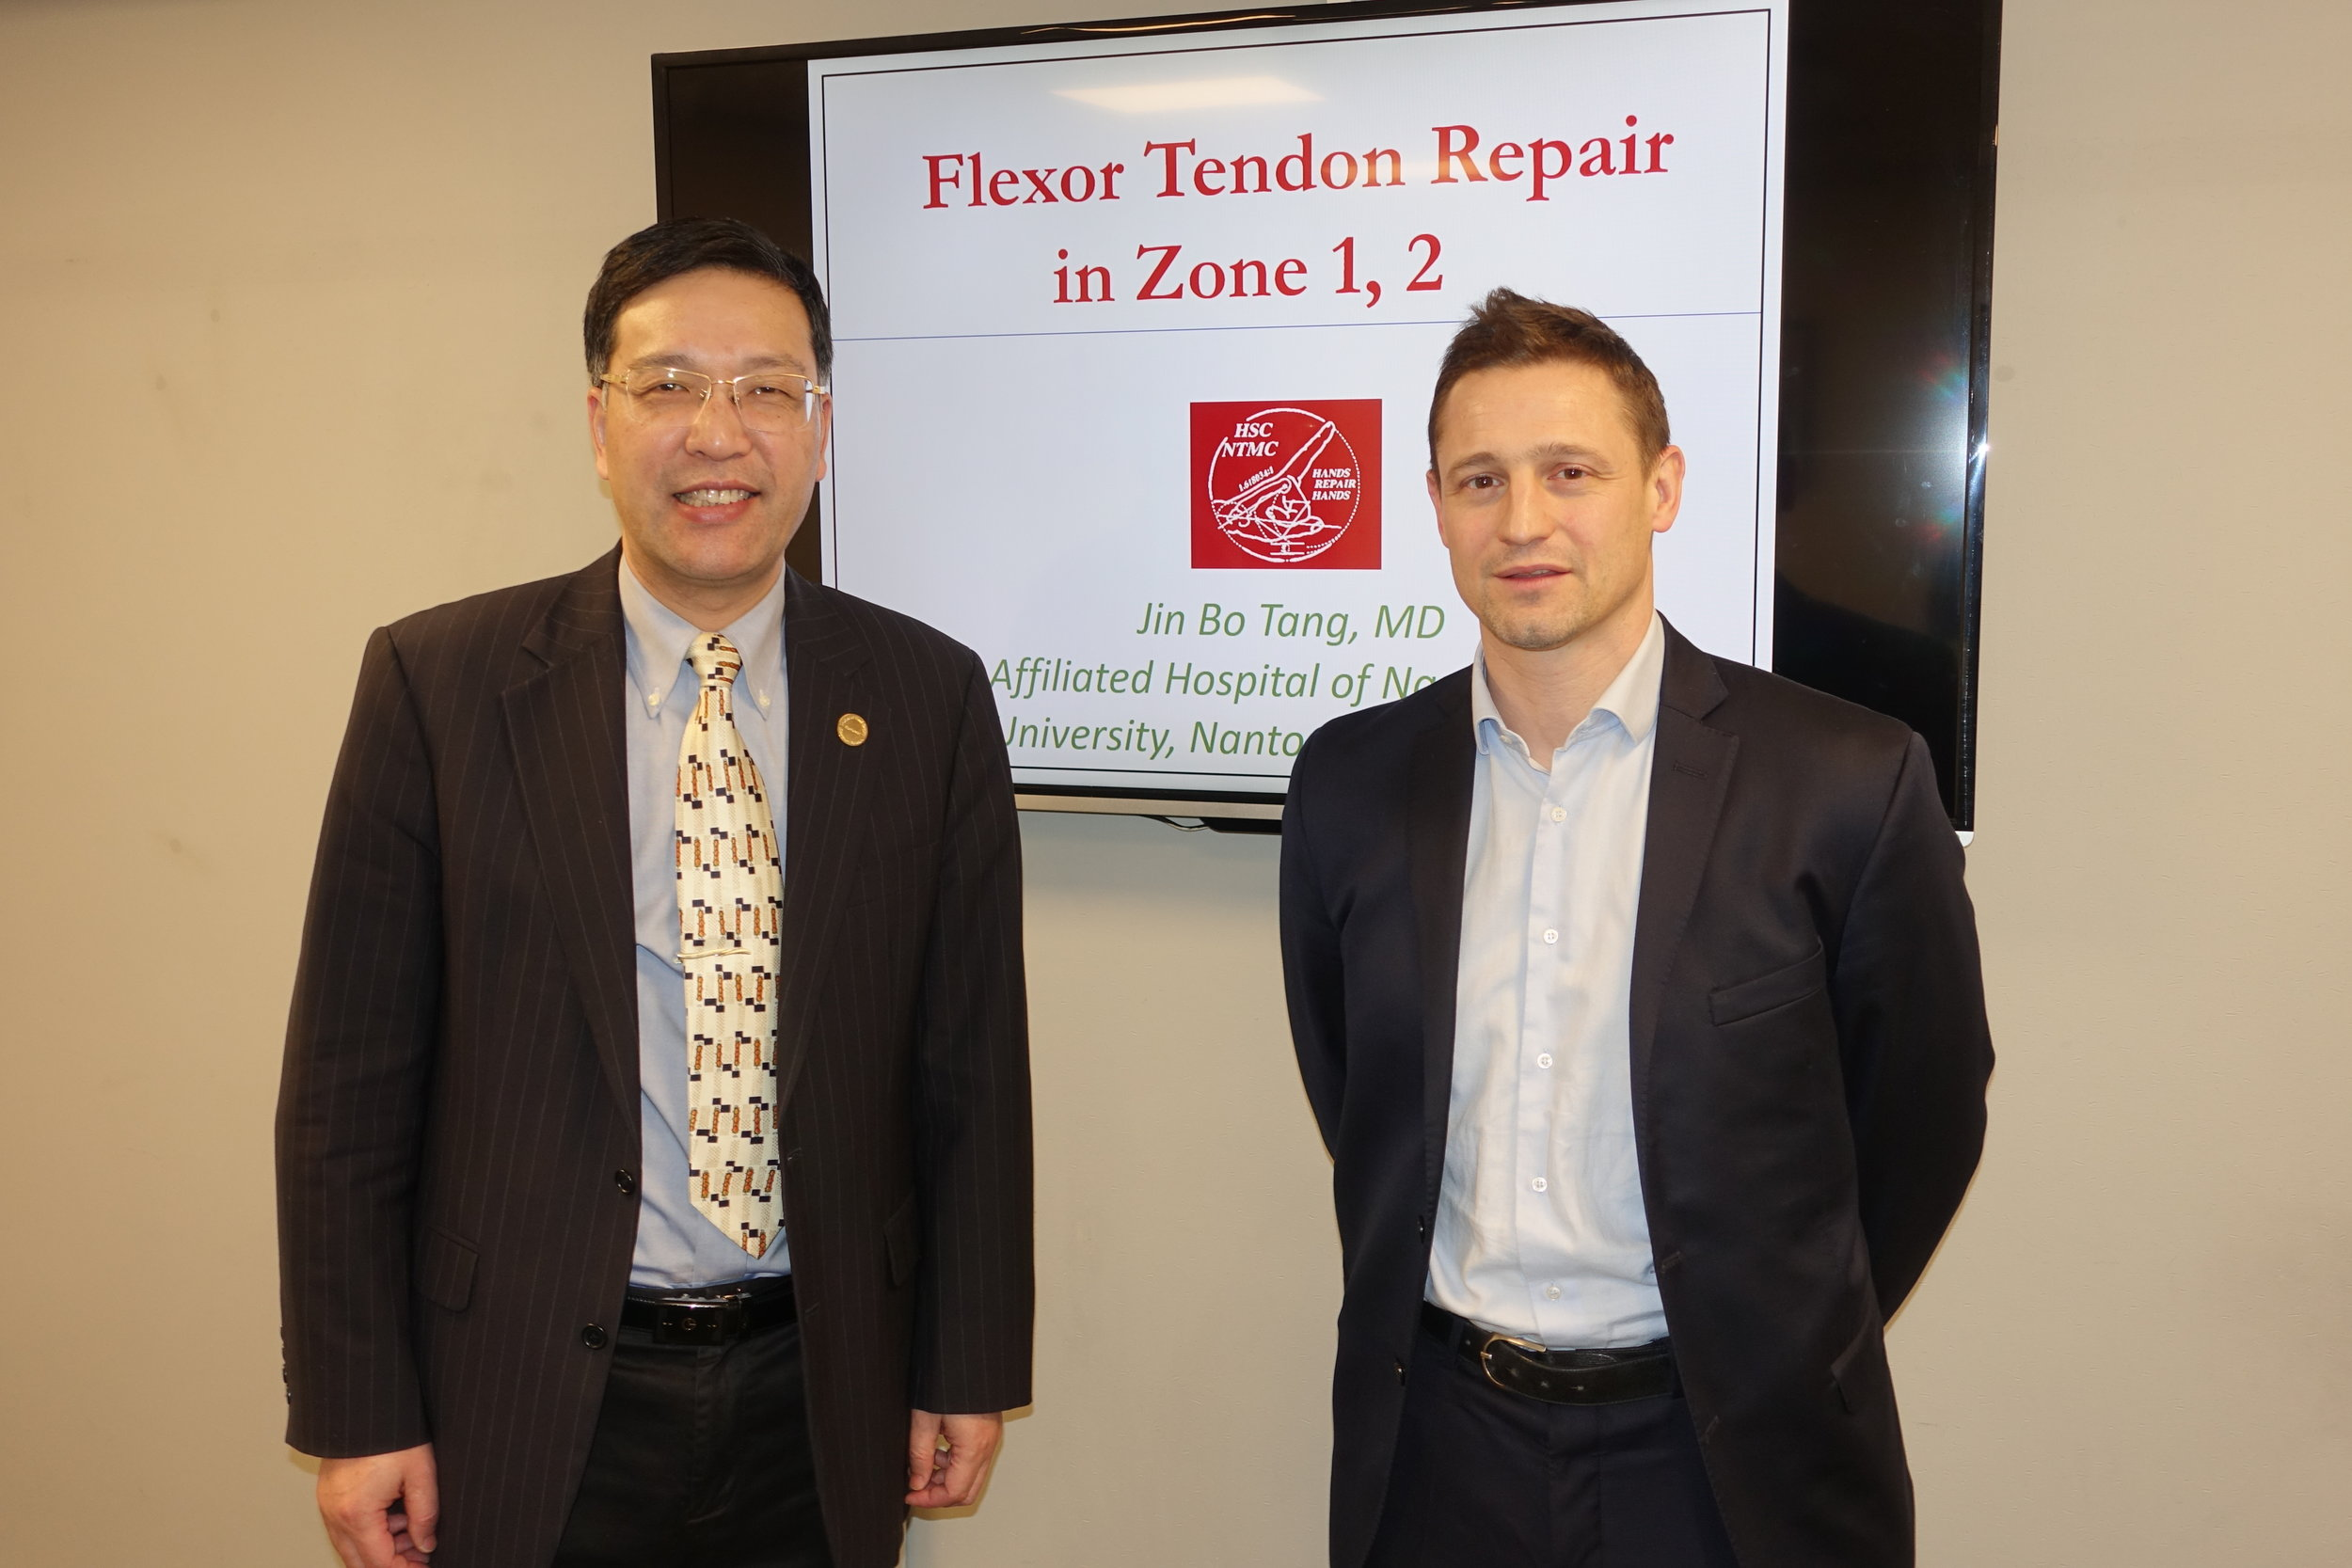 Professor Jin Bo Tang and Mr Thomas Giesen